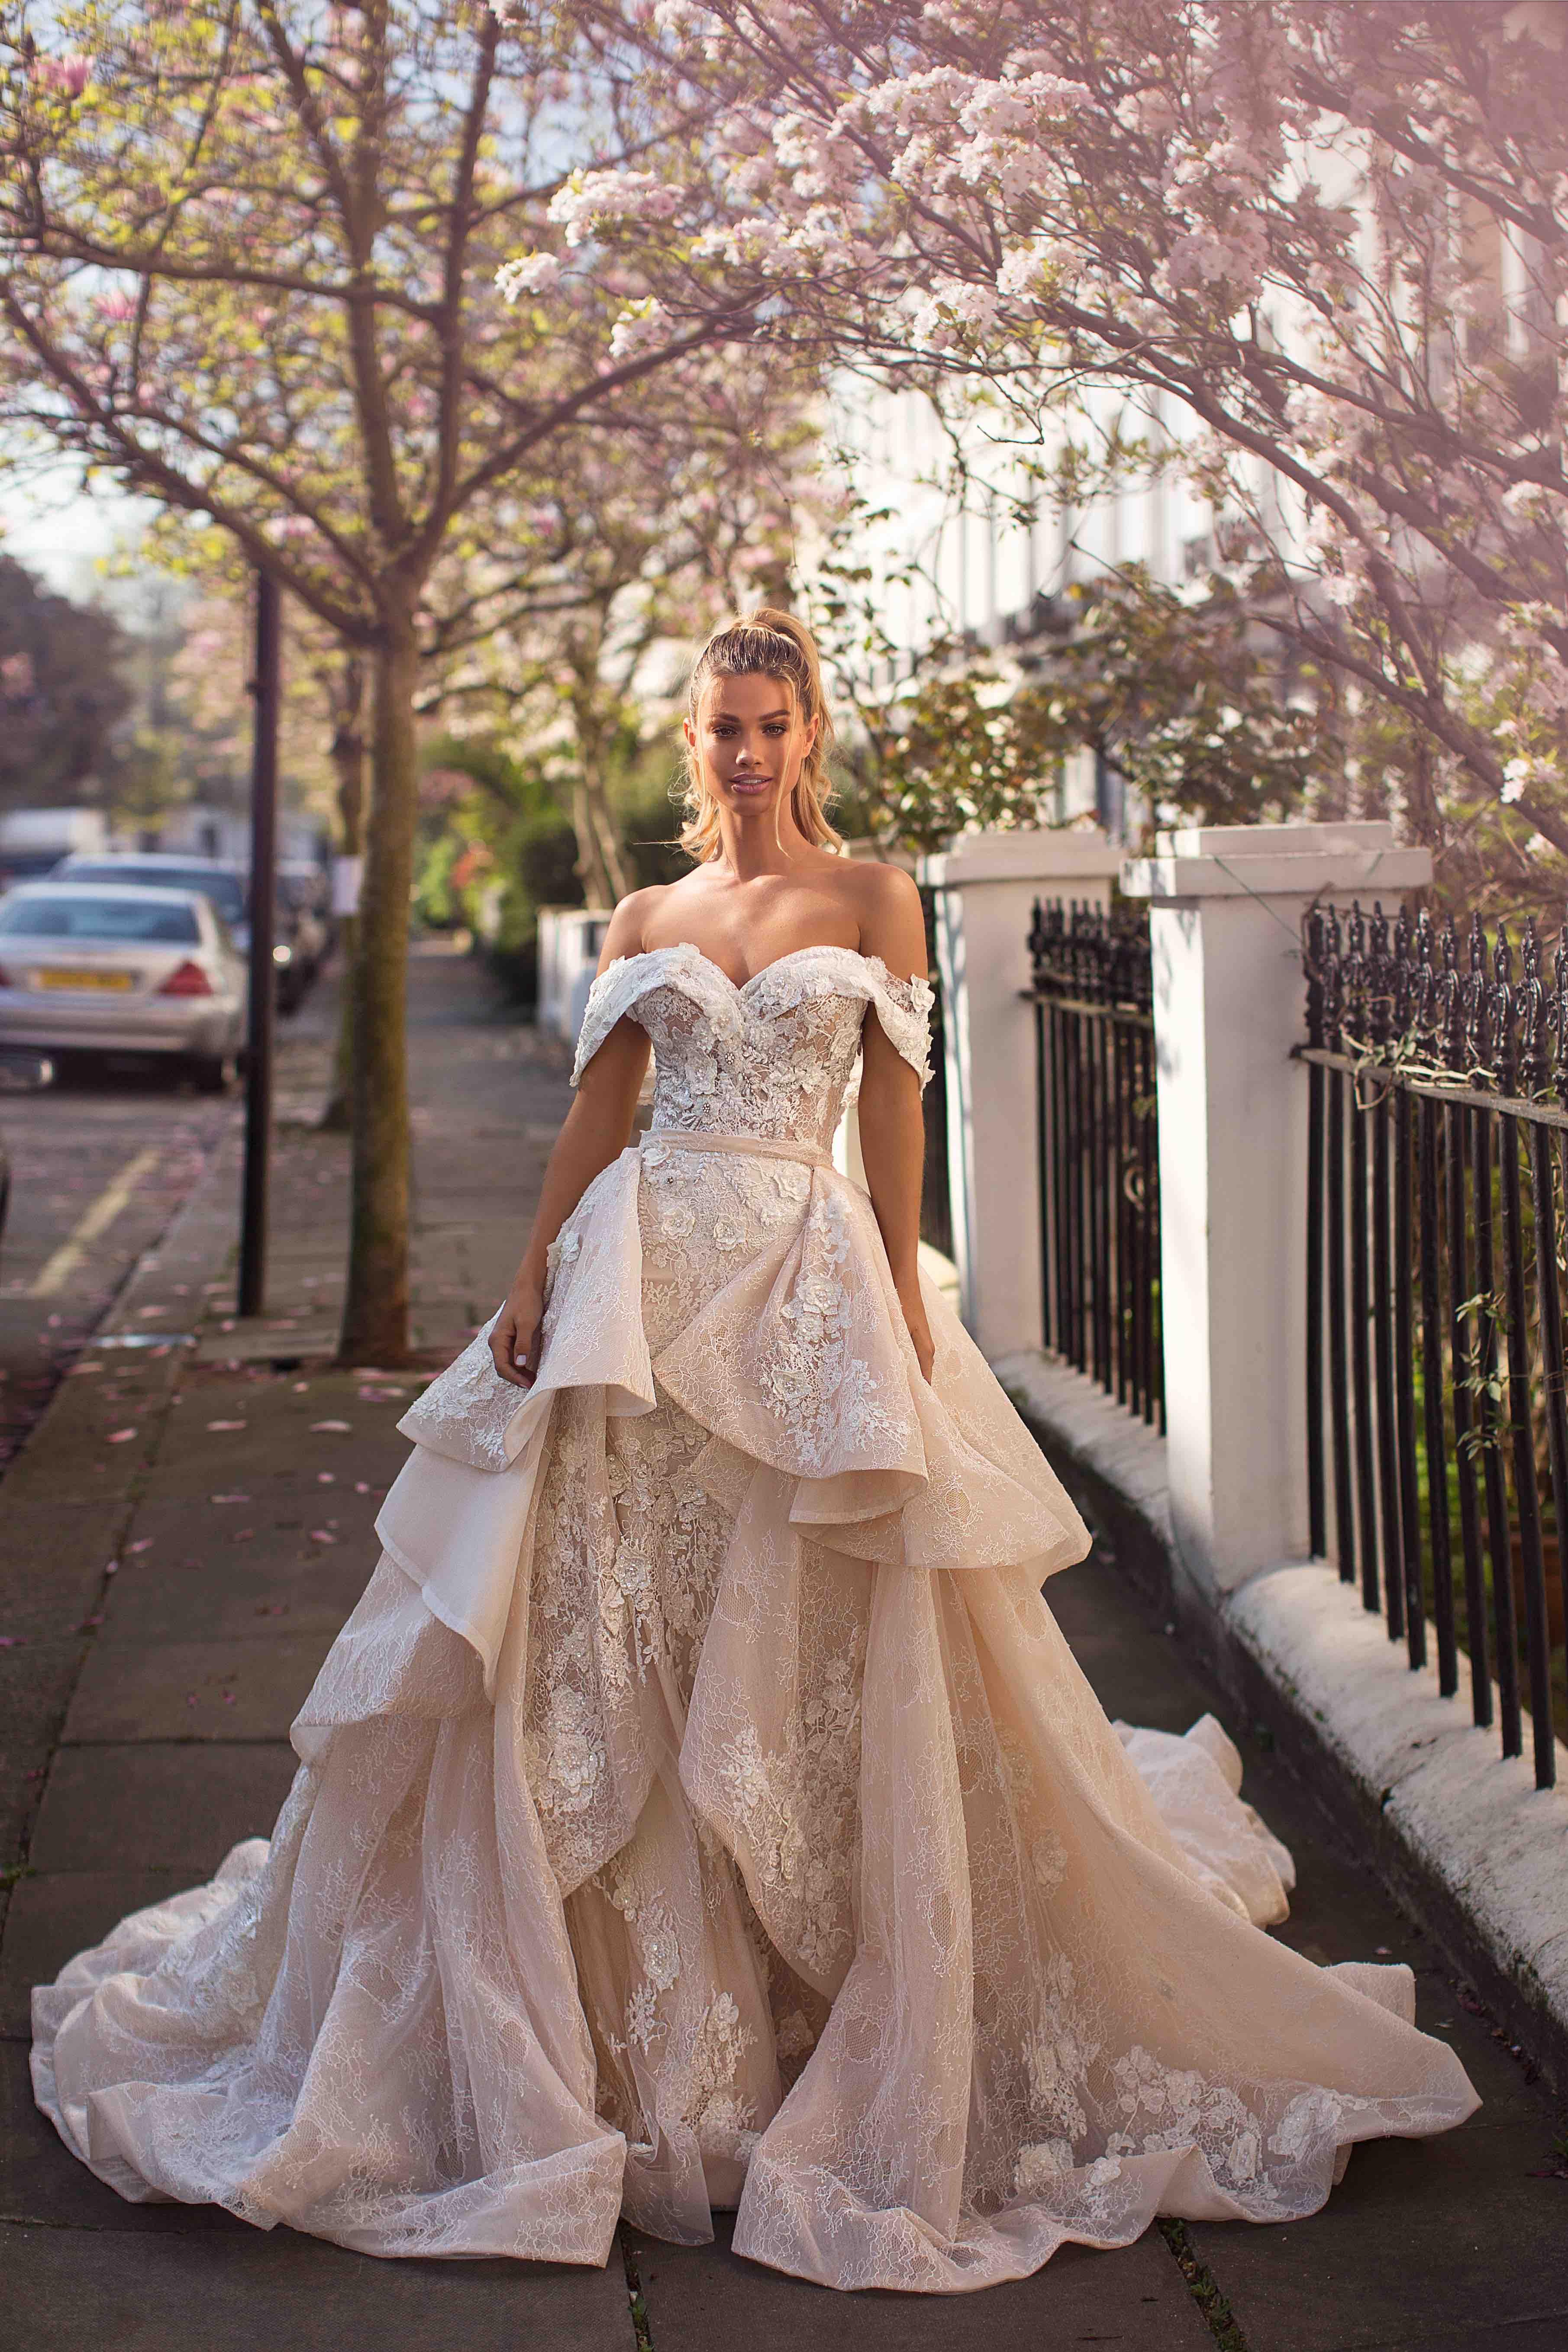 52d18b19ccb Boutique Wedding Dresses Toronto - Gomes Weine AG